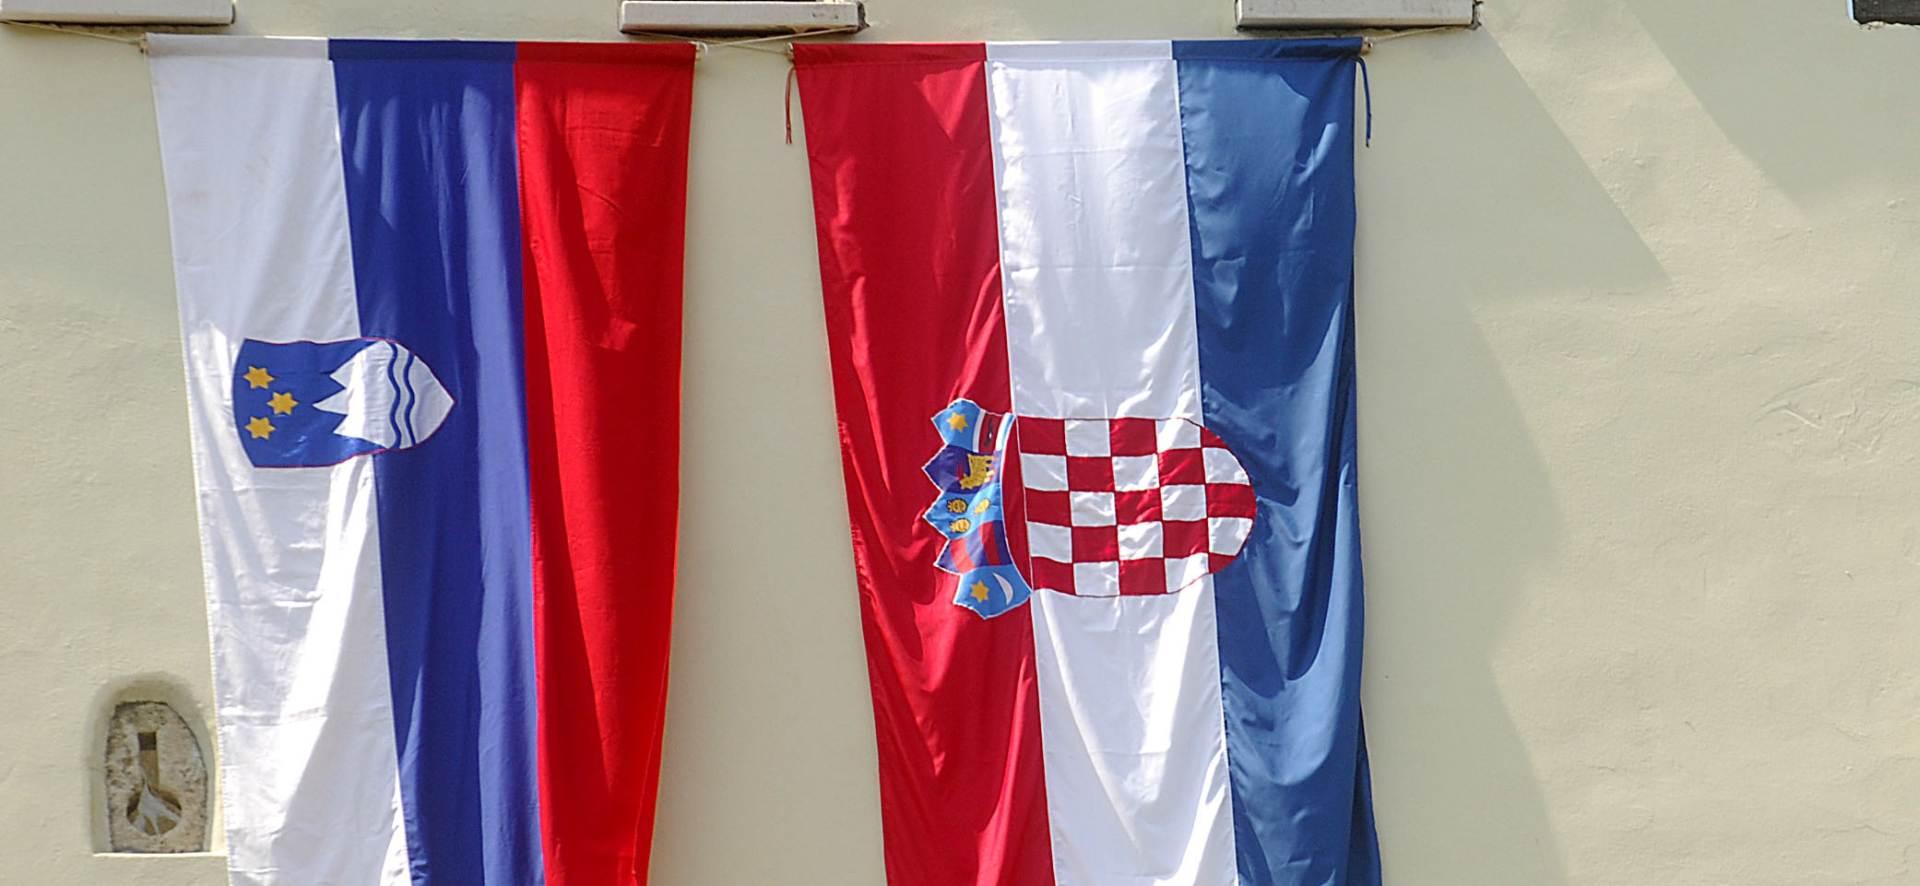 ZBOG AFERA: Geržina odustao od položaja slovenskog veleposlanika u Zagrebu